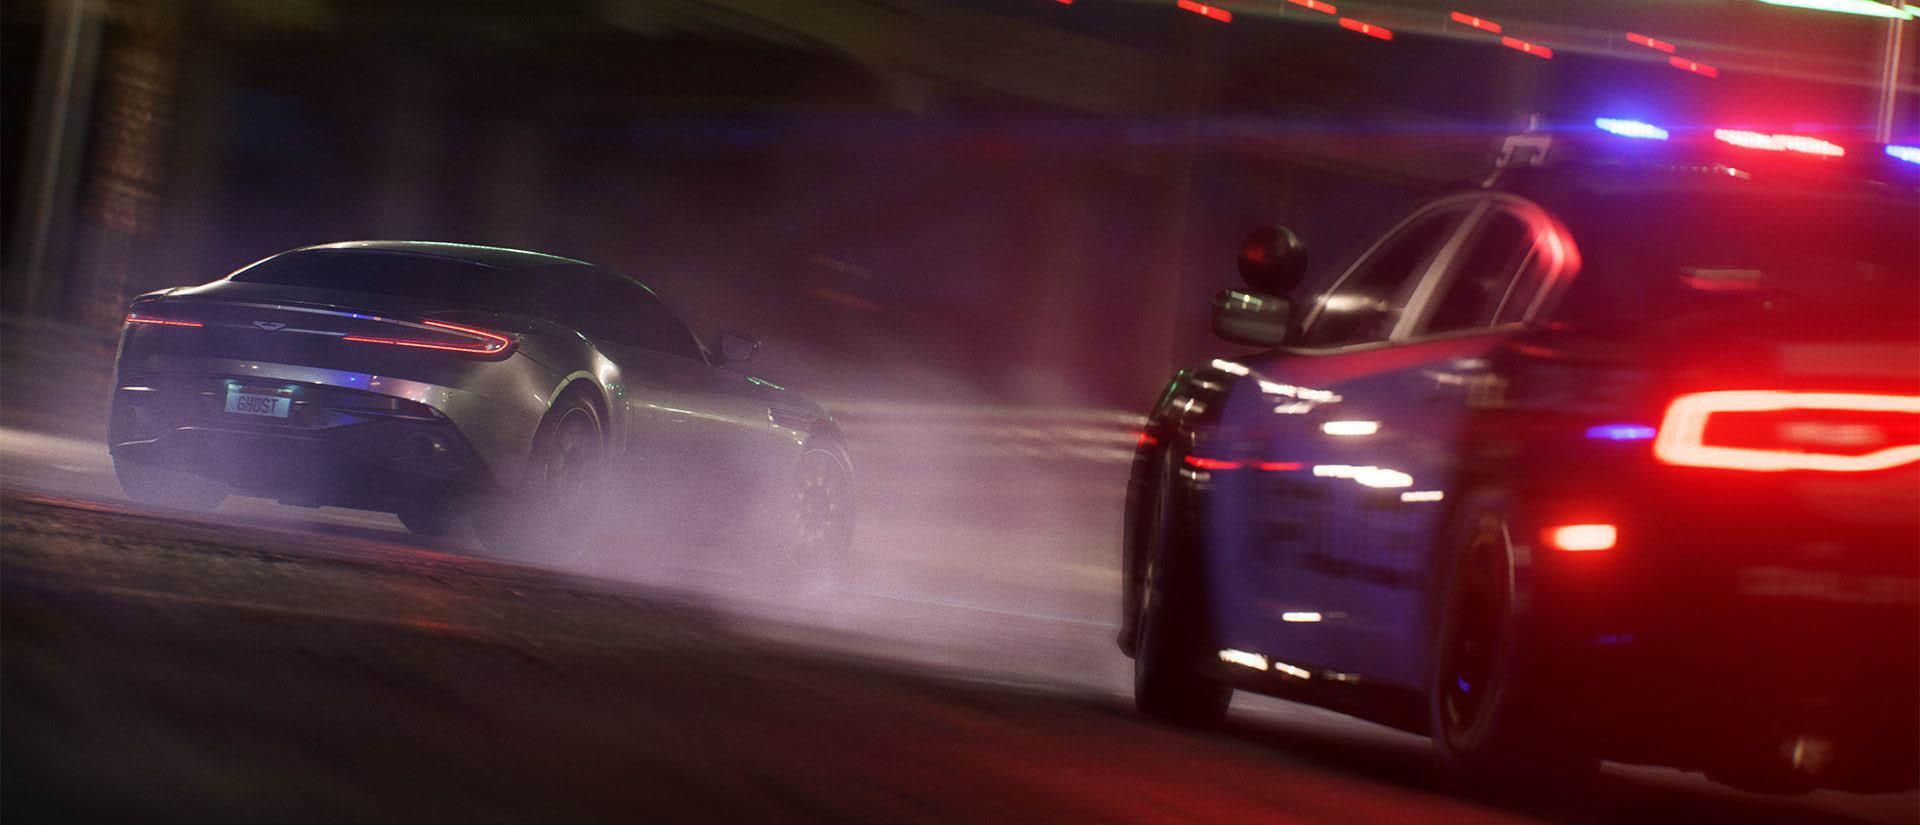 Diesjähriger Need for Speed Ableger soll zurück zu den Wurzeln